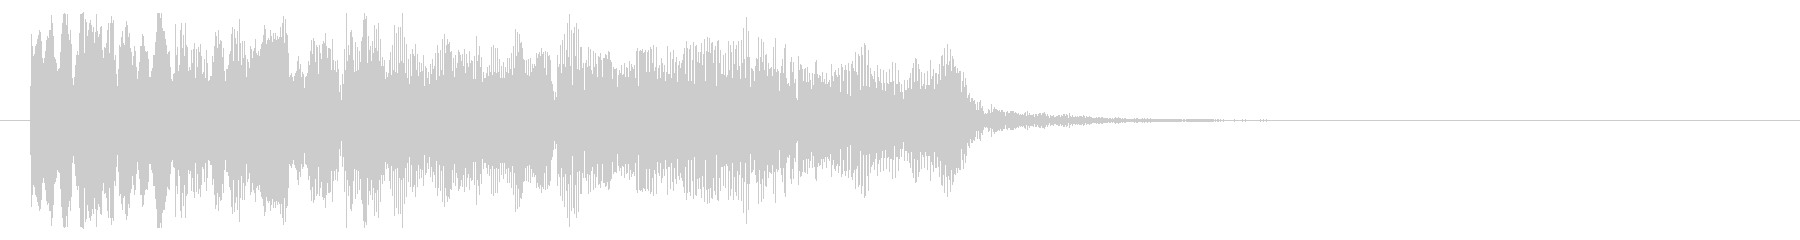 8bitパワーdown-01-3_revの未再生の波形